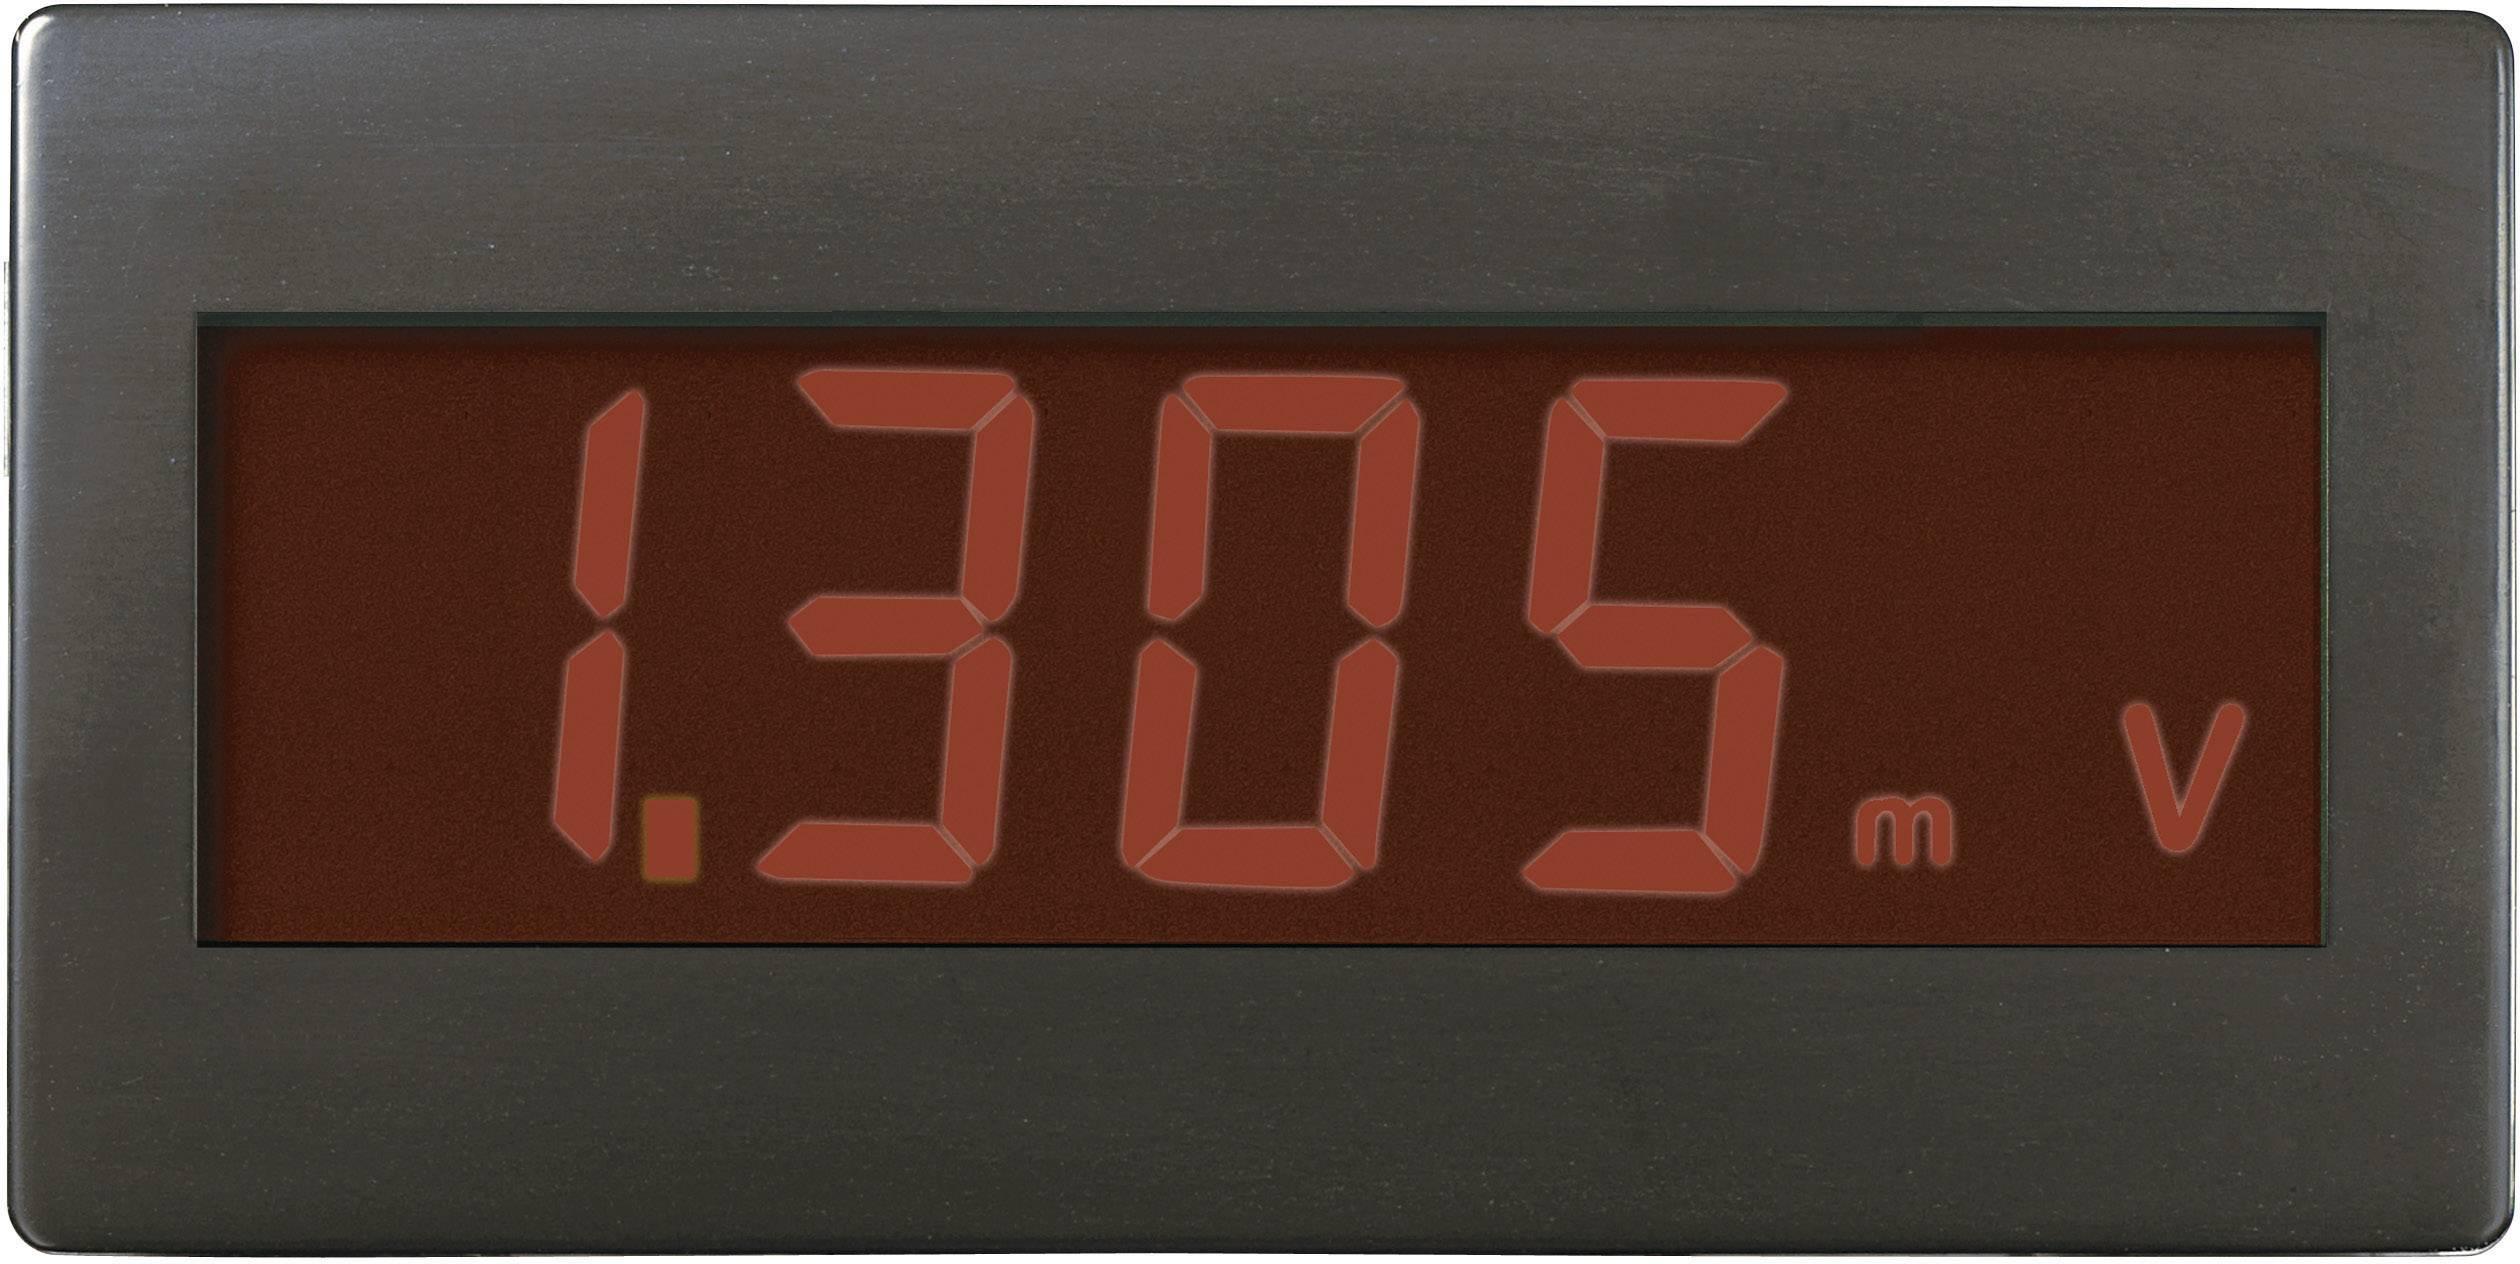 Digitálne panelové meradlo Voltcraft DVM-230RN, 45 x 22